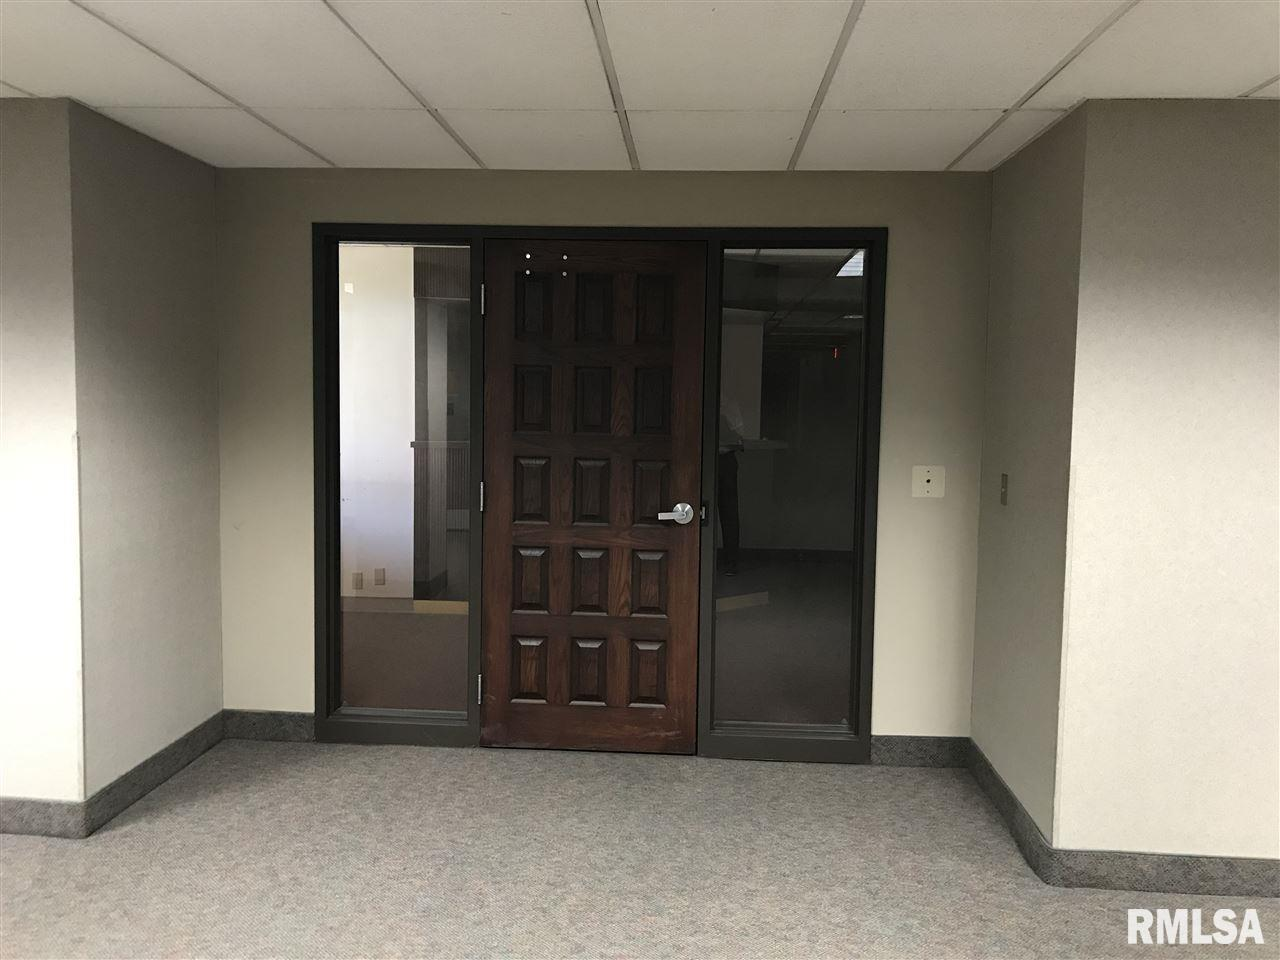 456 FULTON Property Photo - Peoria, IL real estate listing